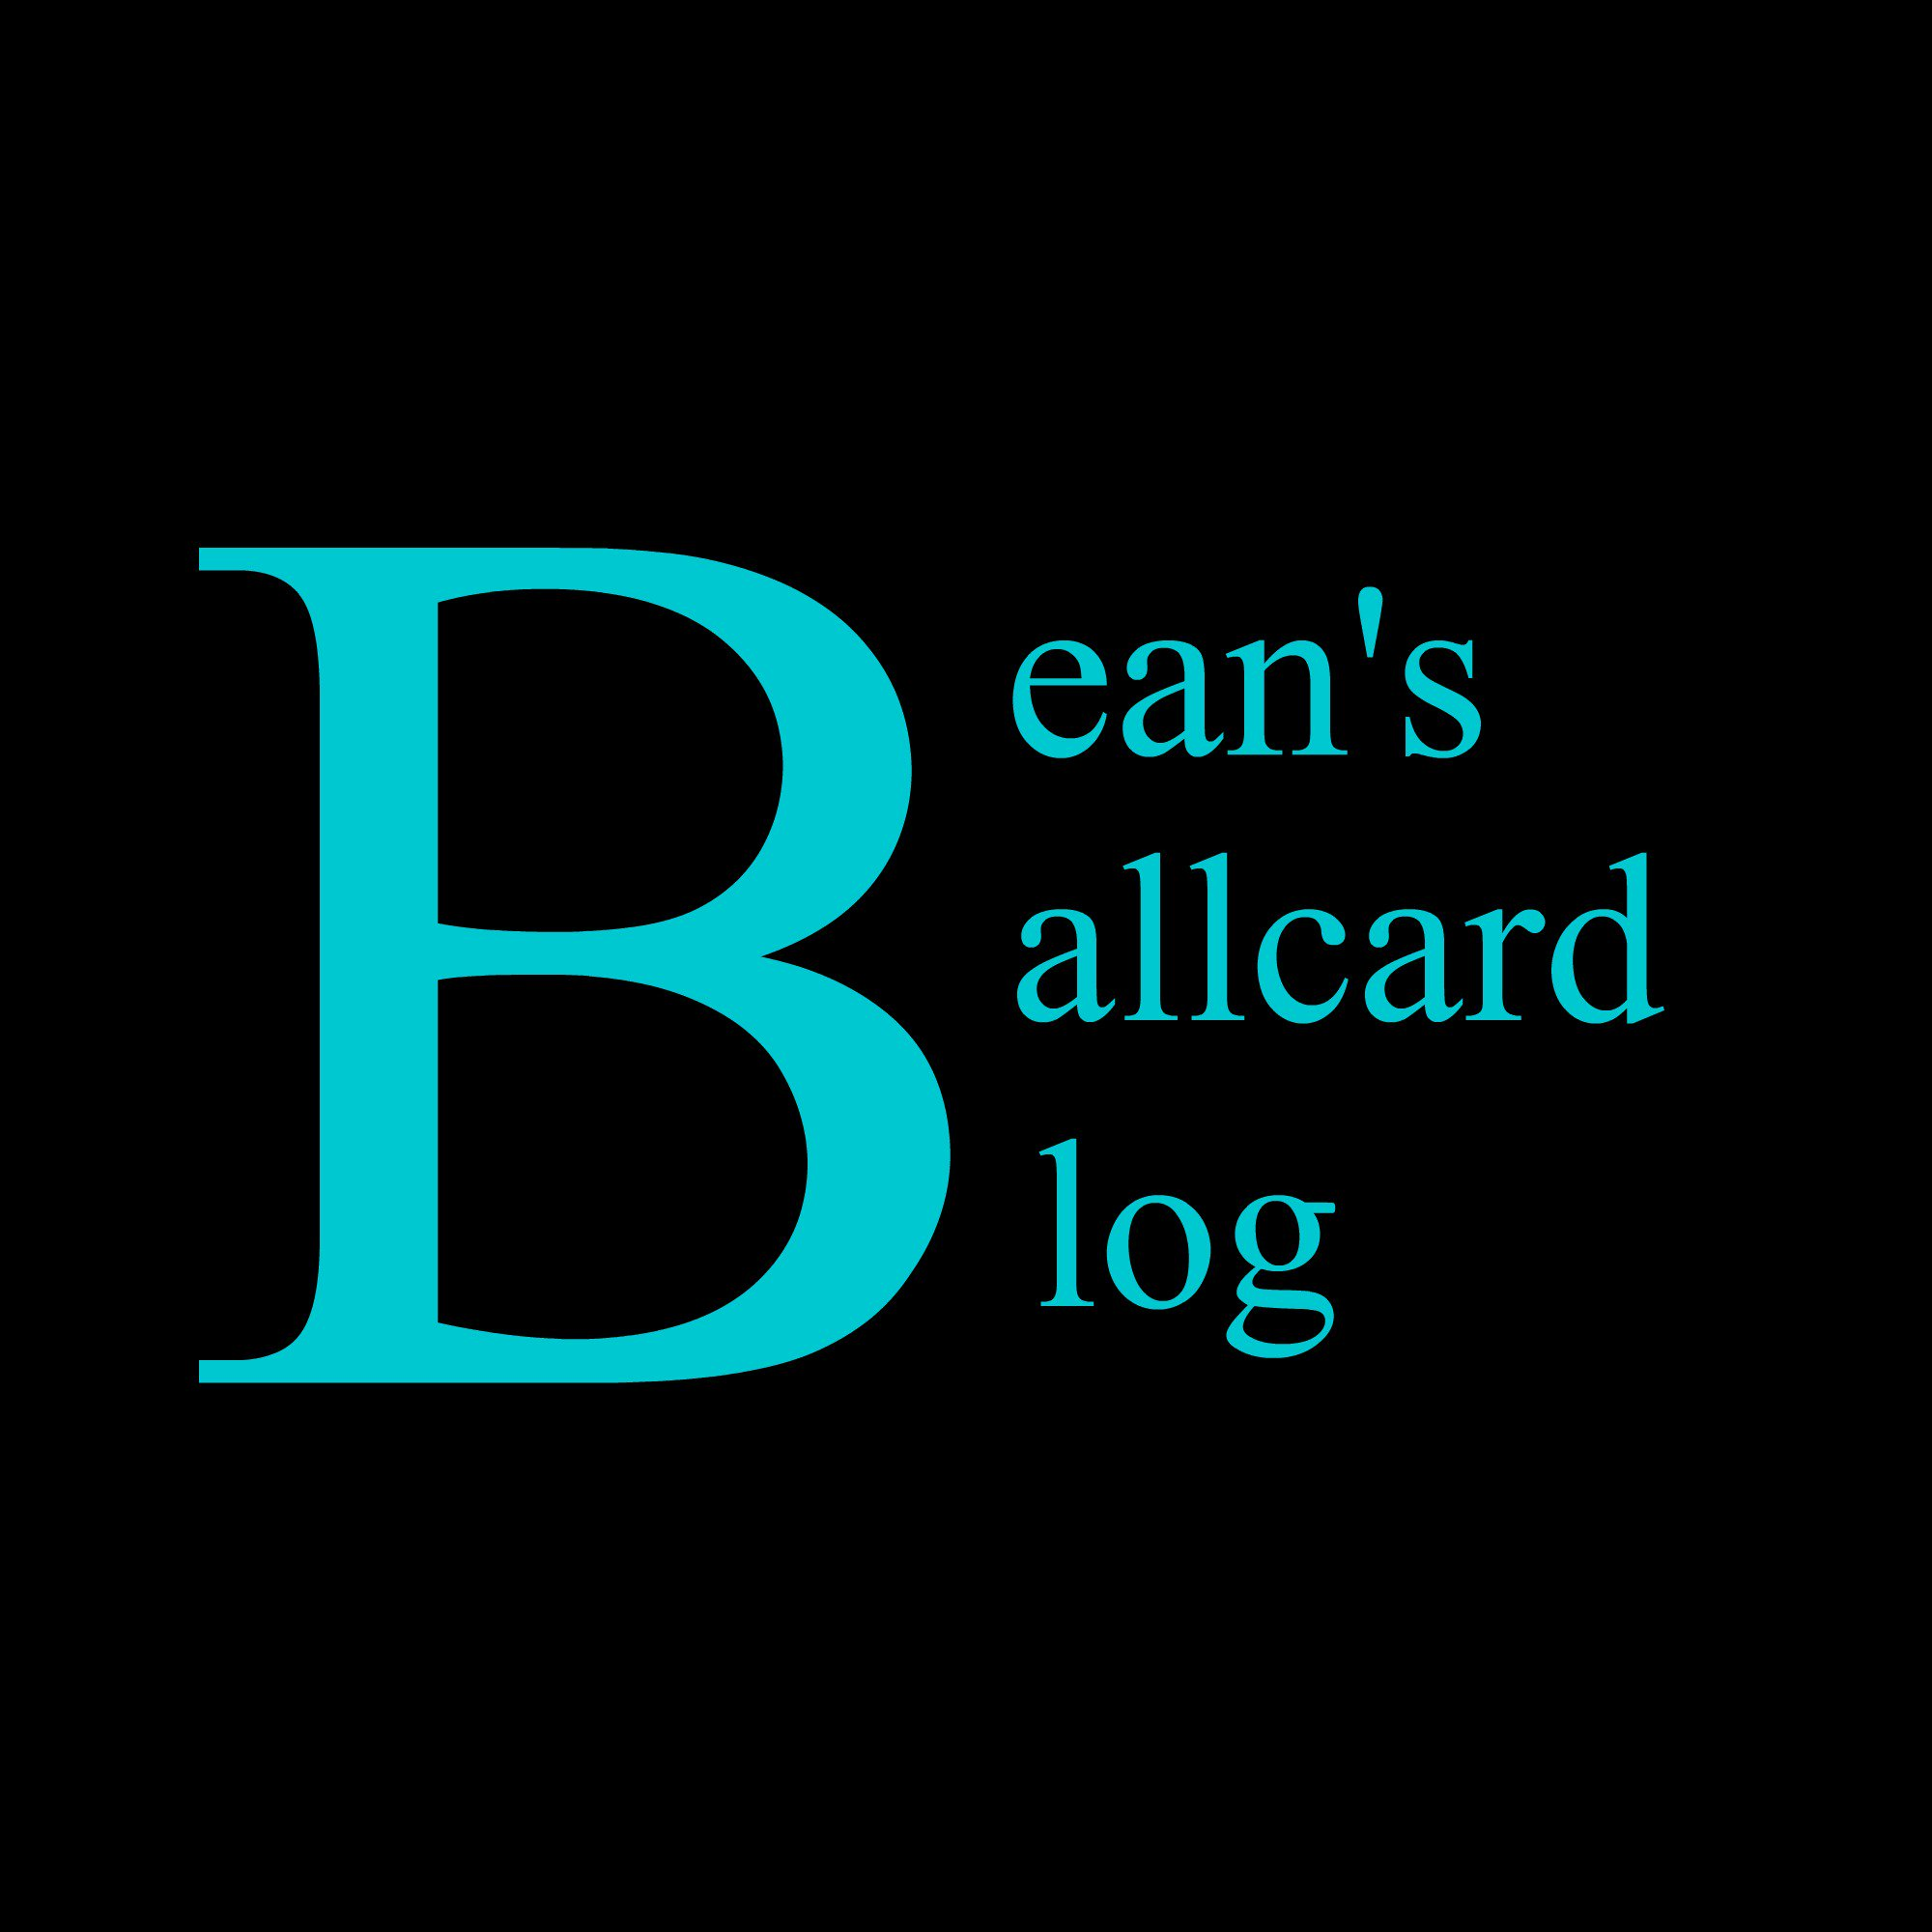 Bean's Ballcard Blog